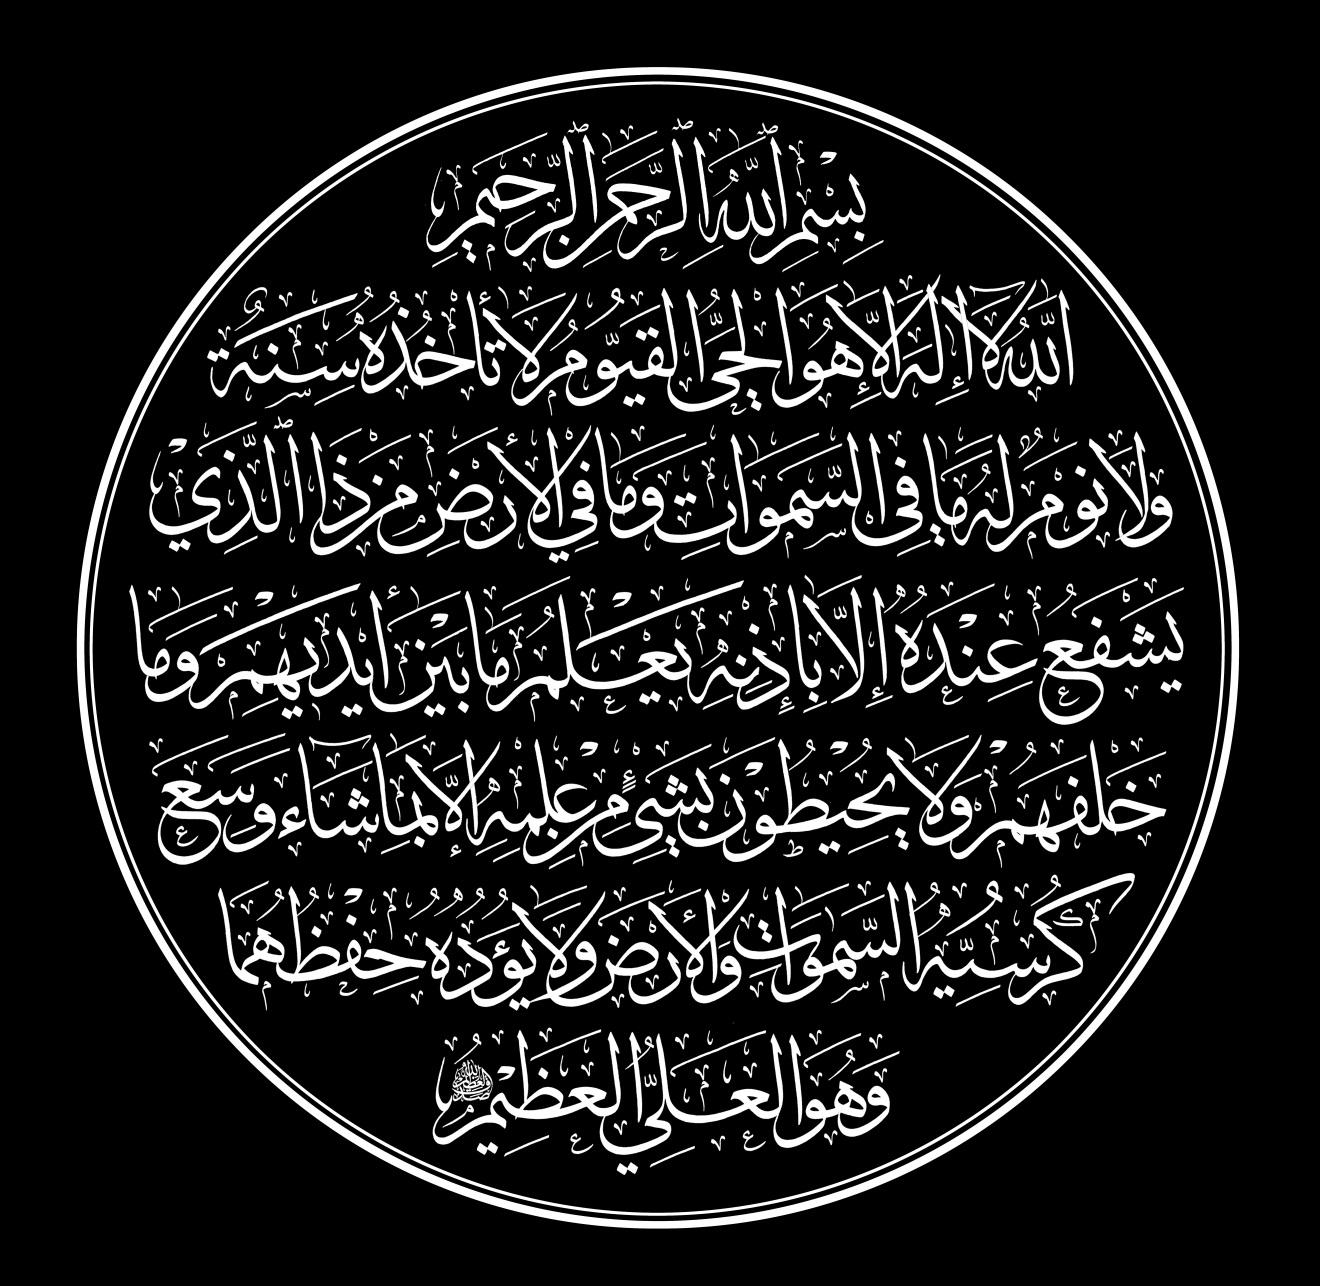 islamic calligraphy ayat kursi black